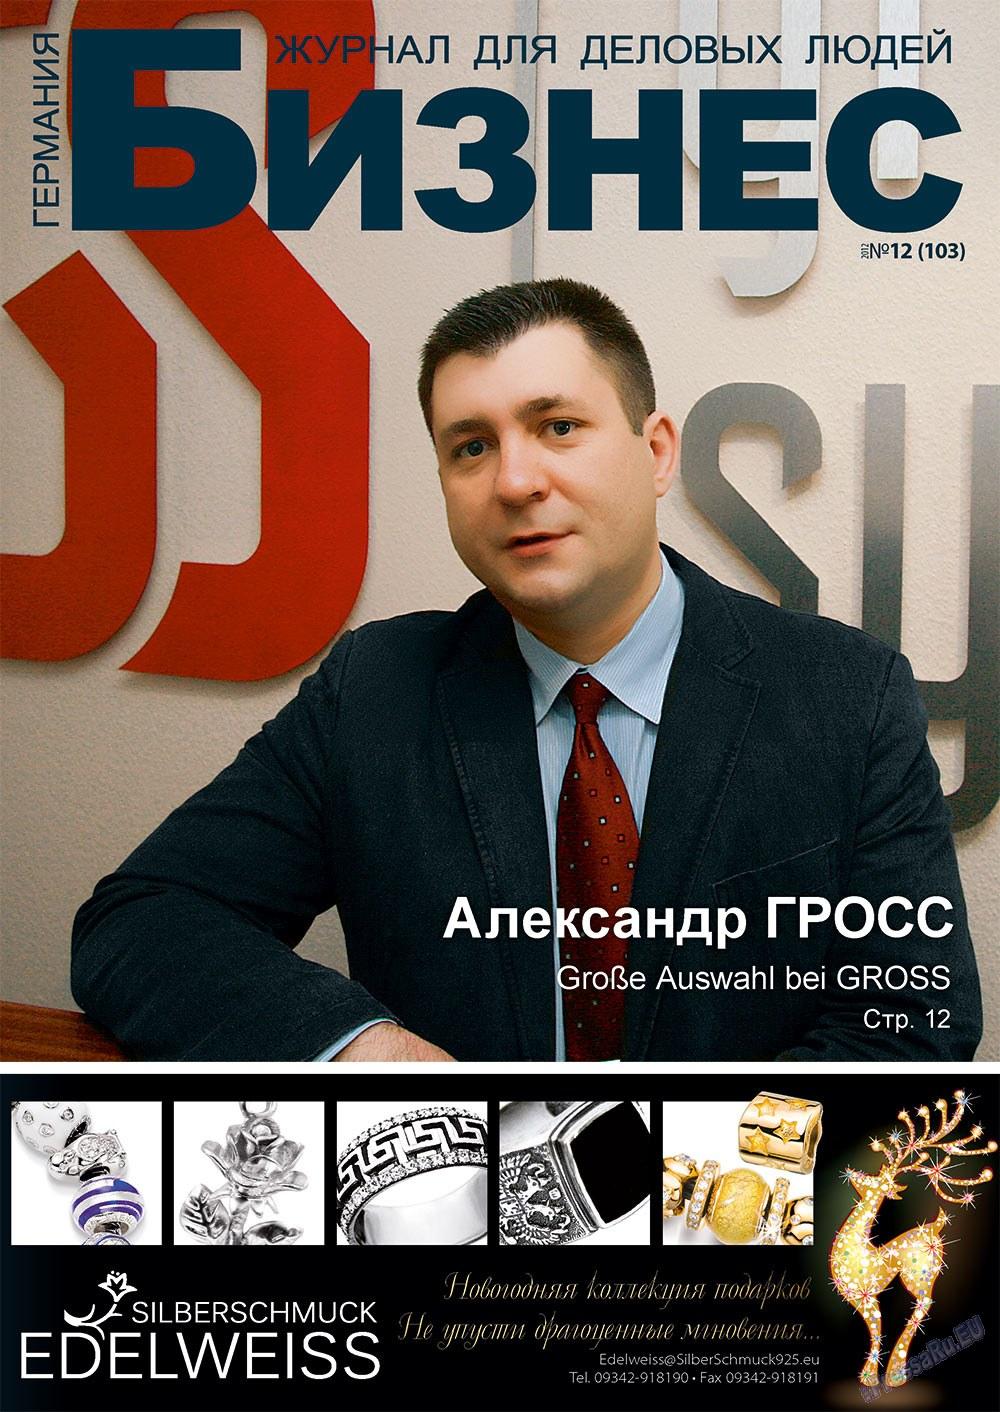 Бизнес (журнал). 2012 год, номер 12, стр. 1